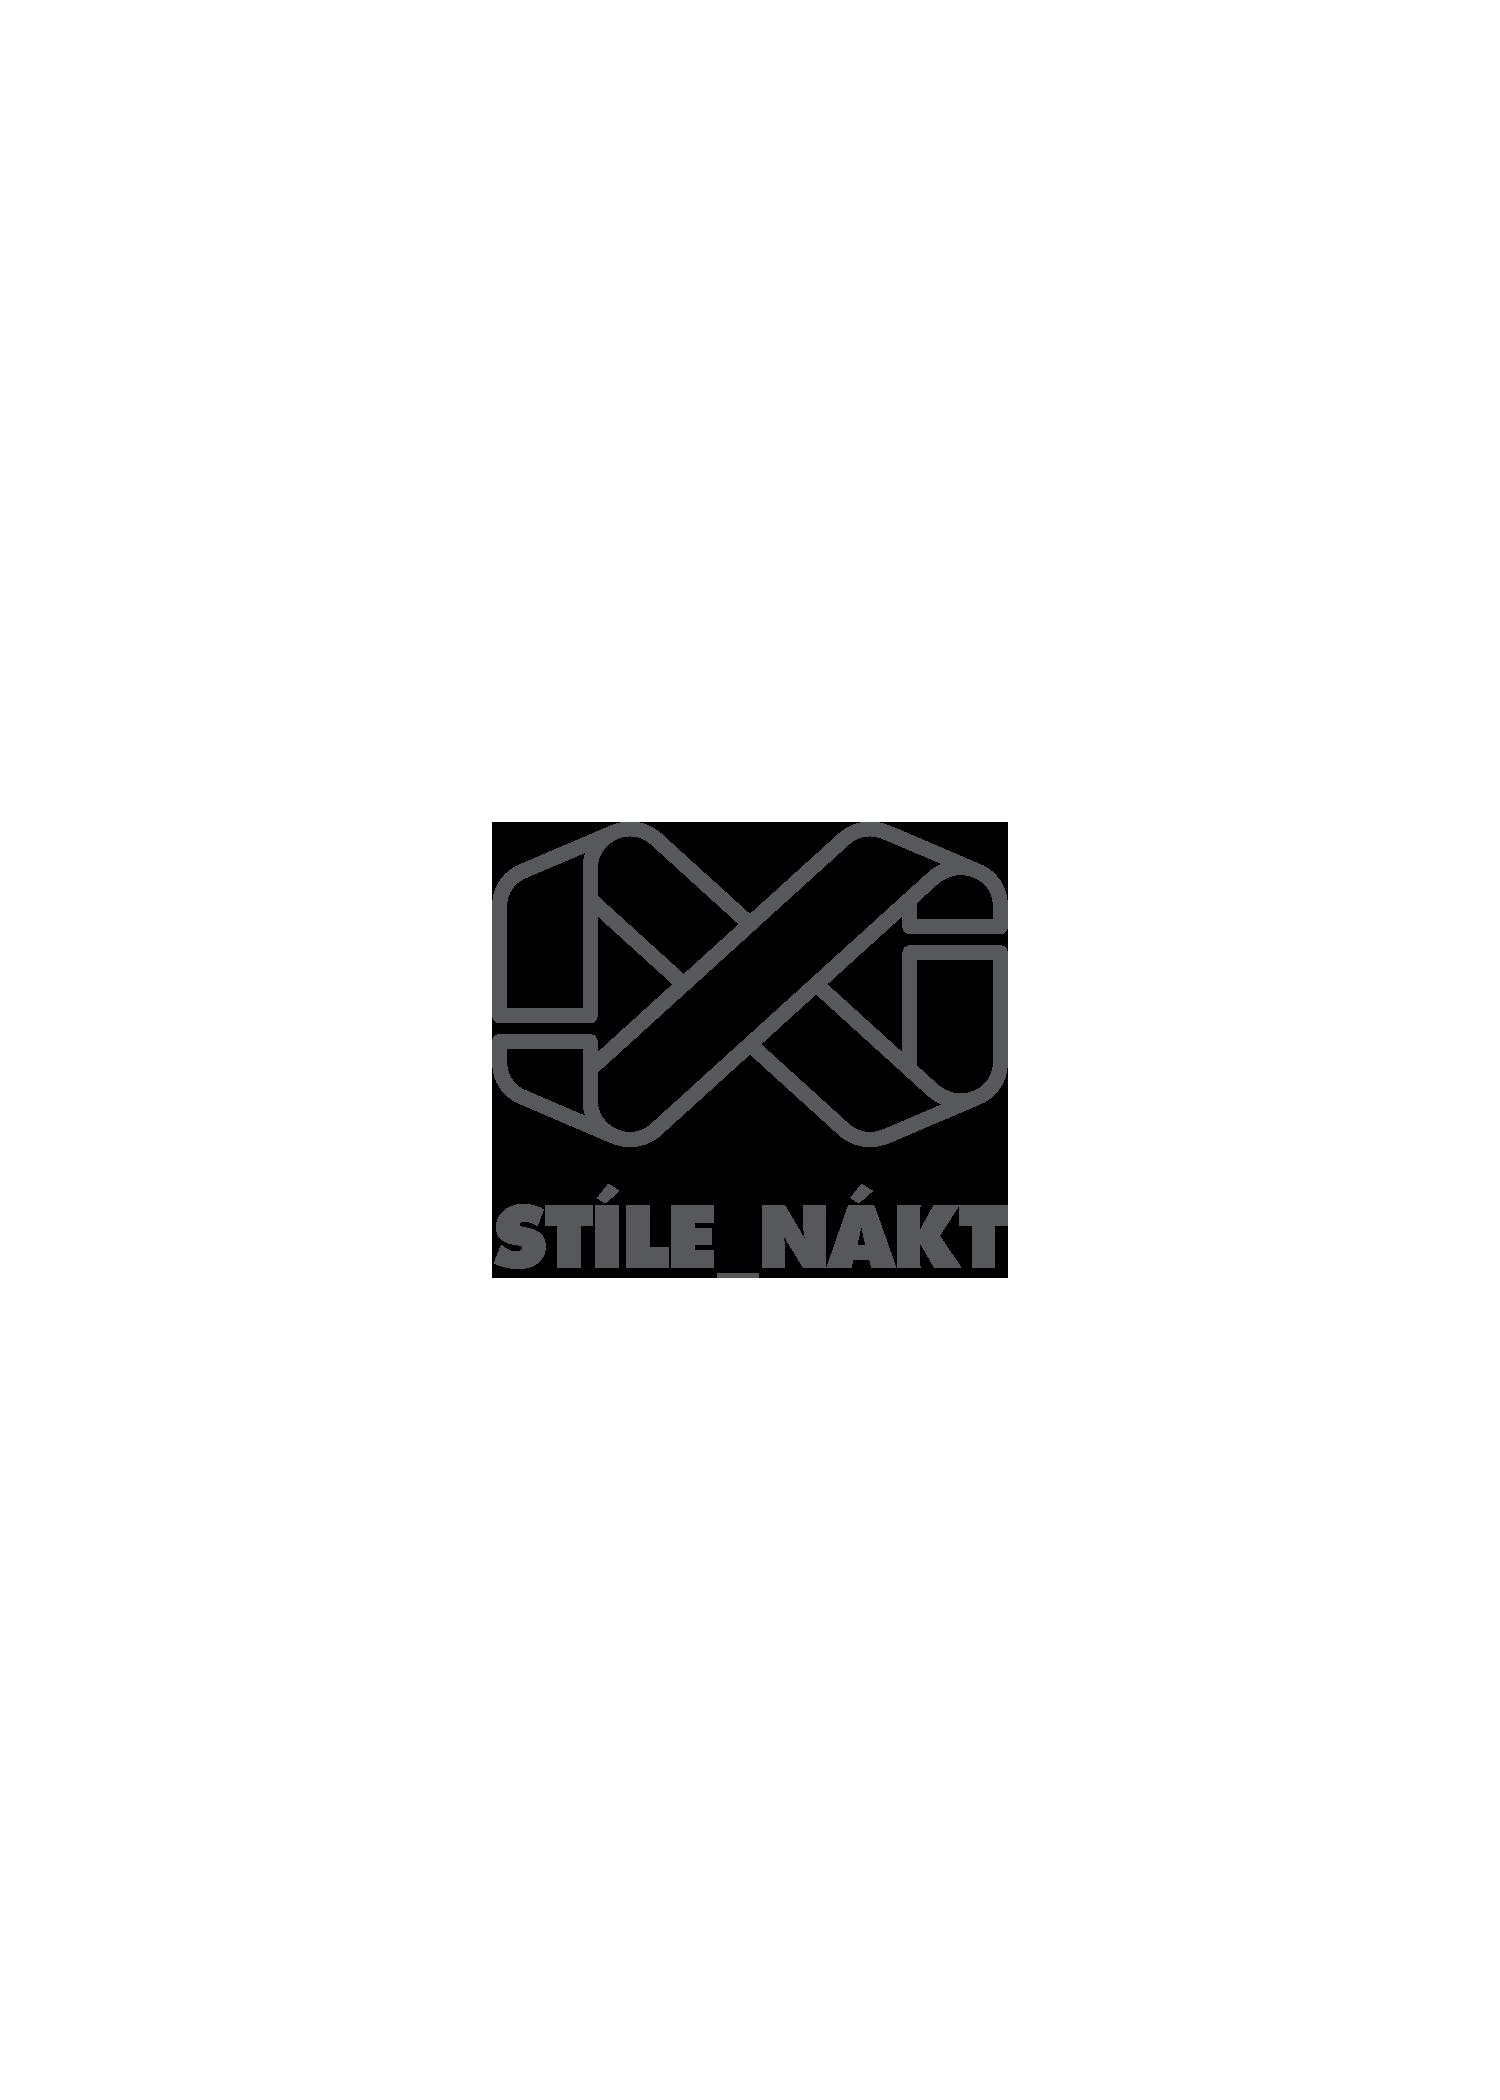 logo_stilenakt.png